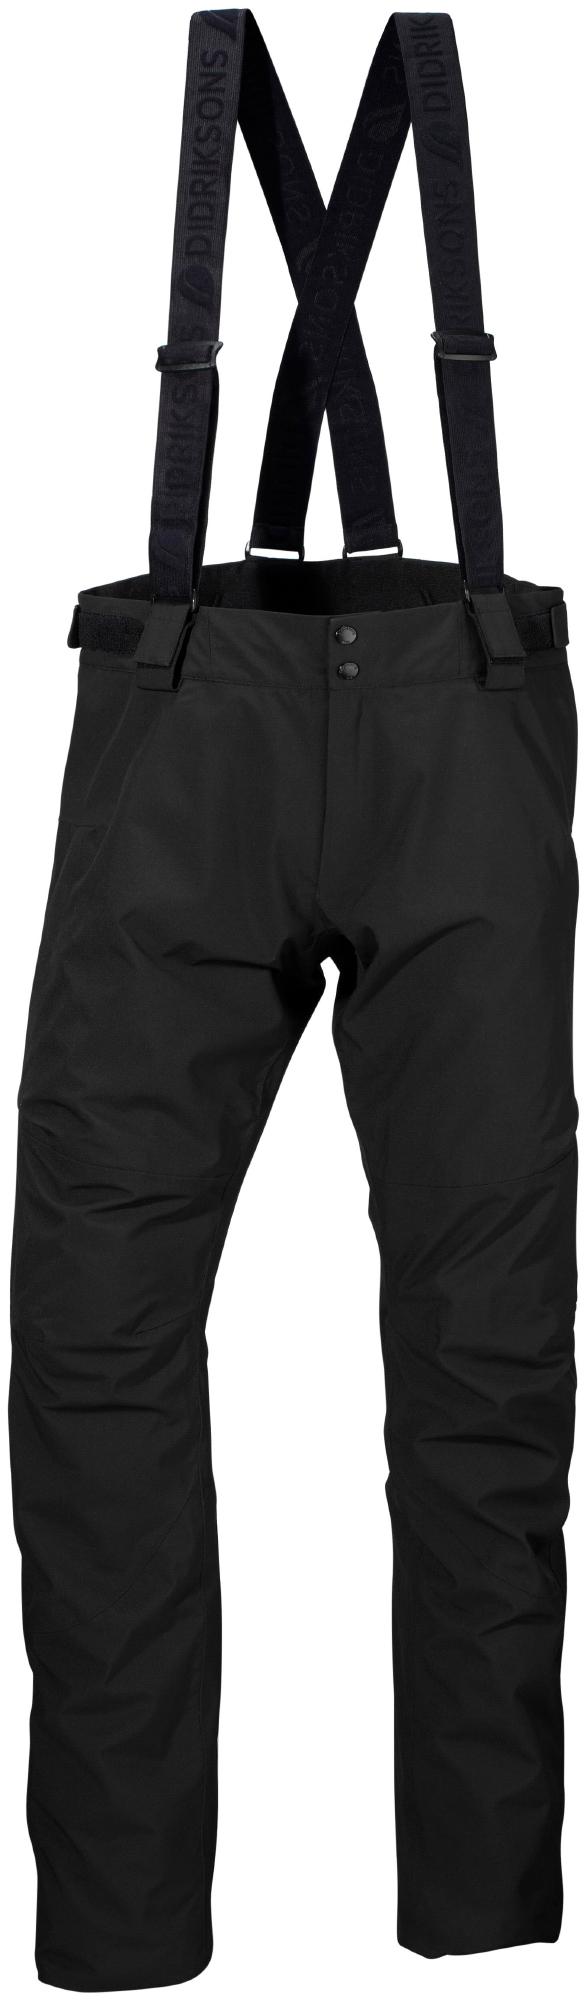 Didriksons Dale Mens Pants - Vandtæt herrebukser m. for - Sort | Trousers